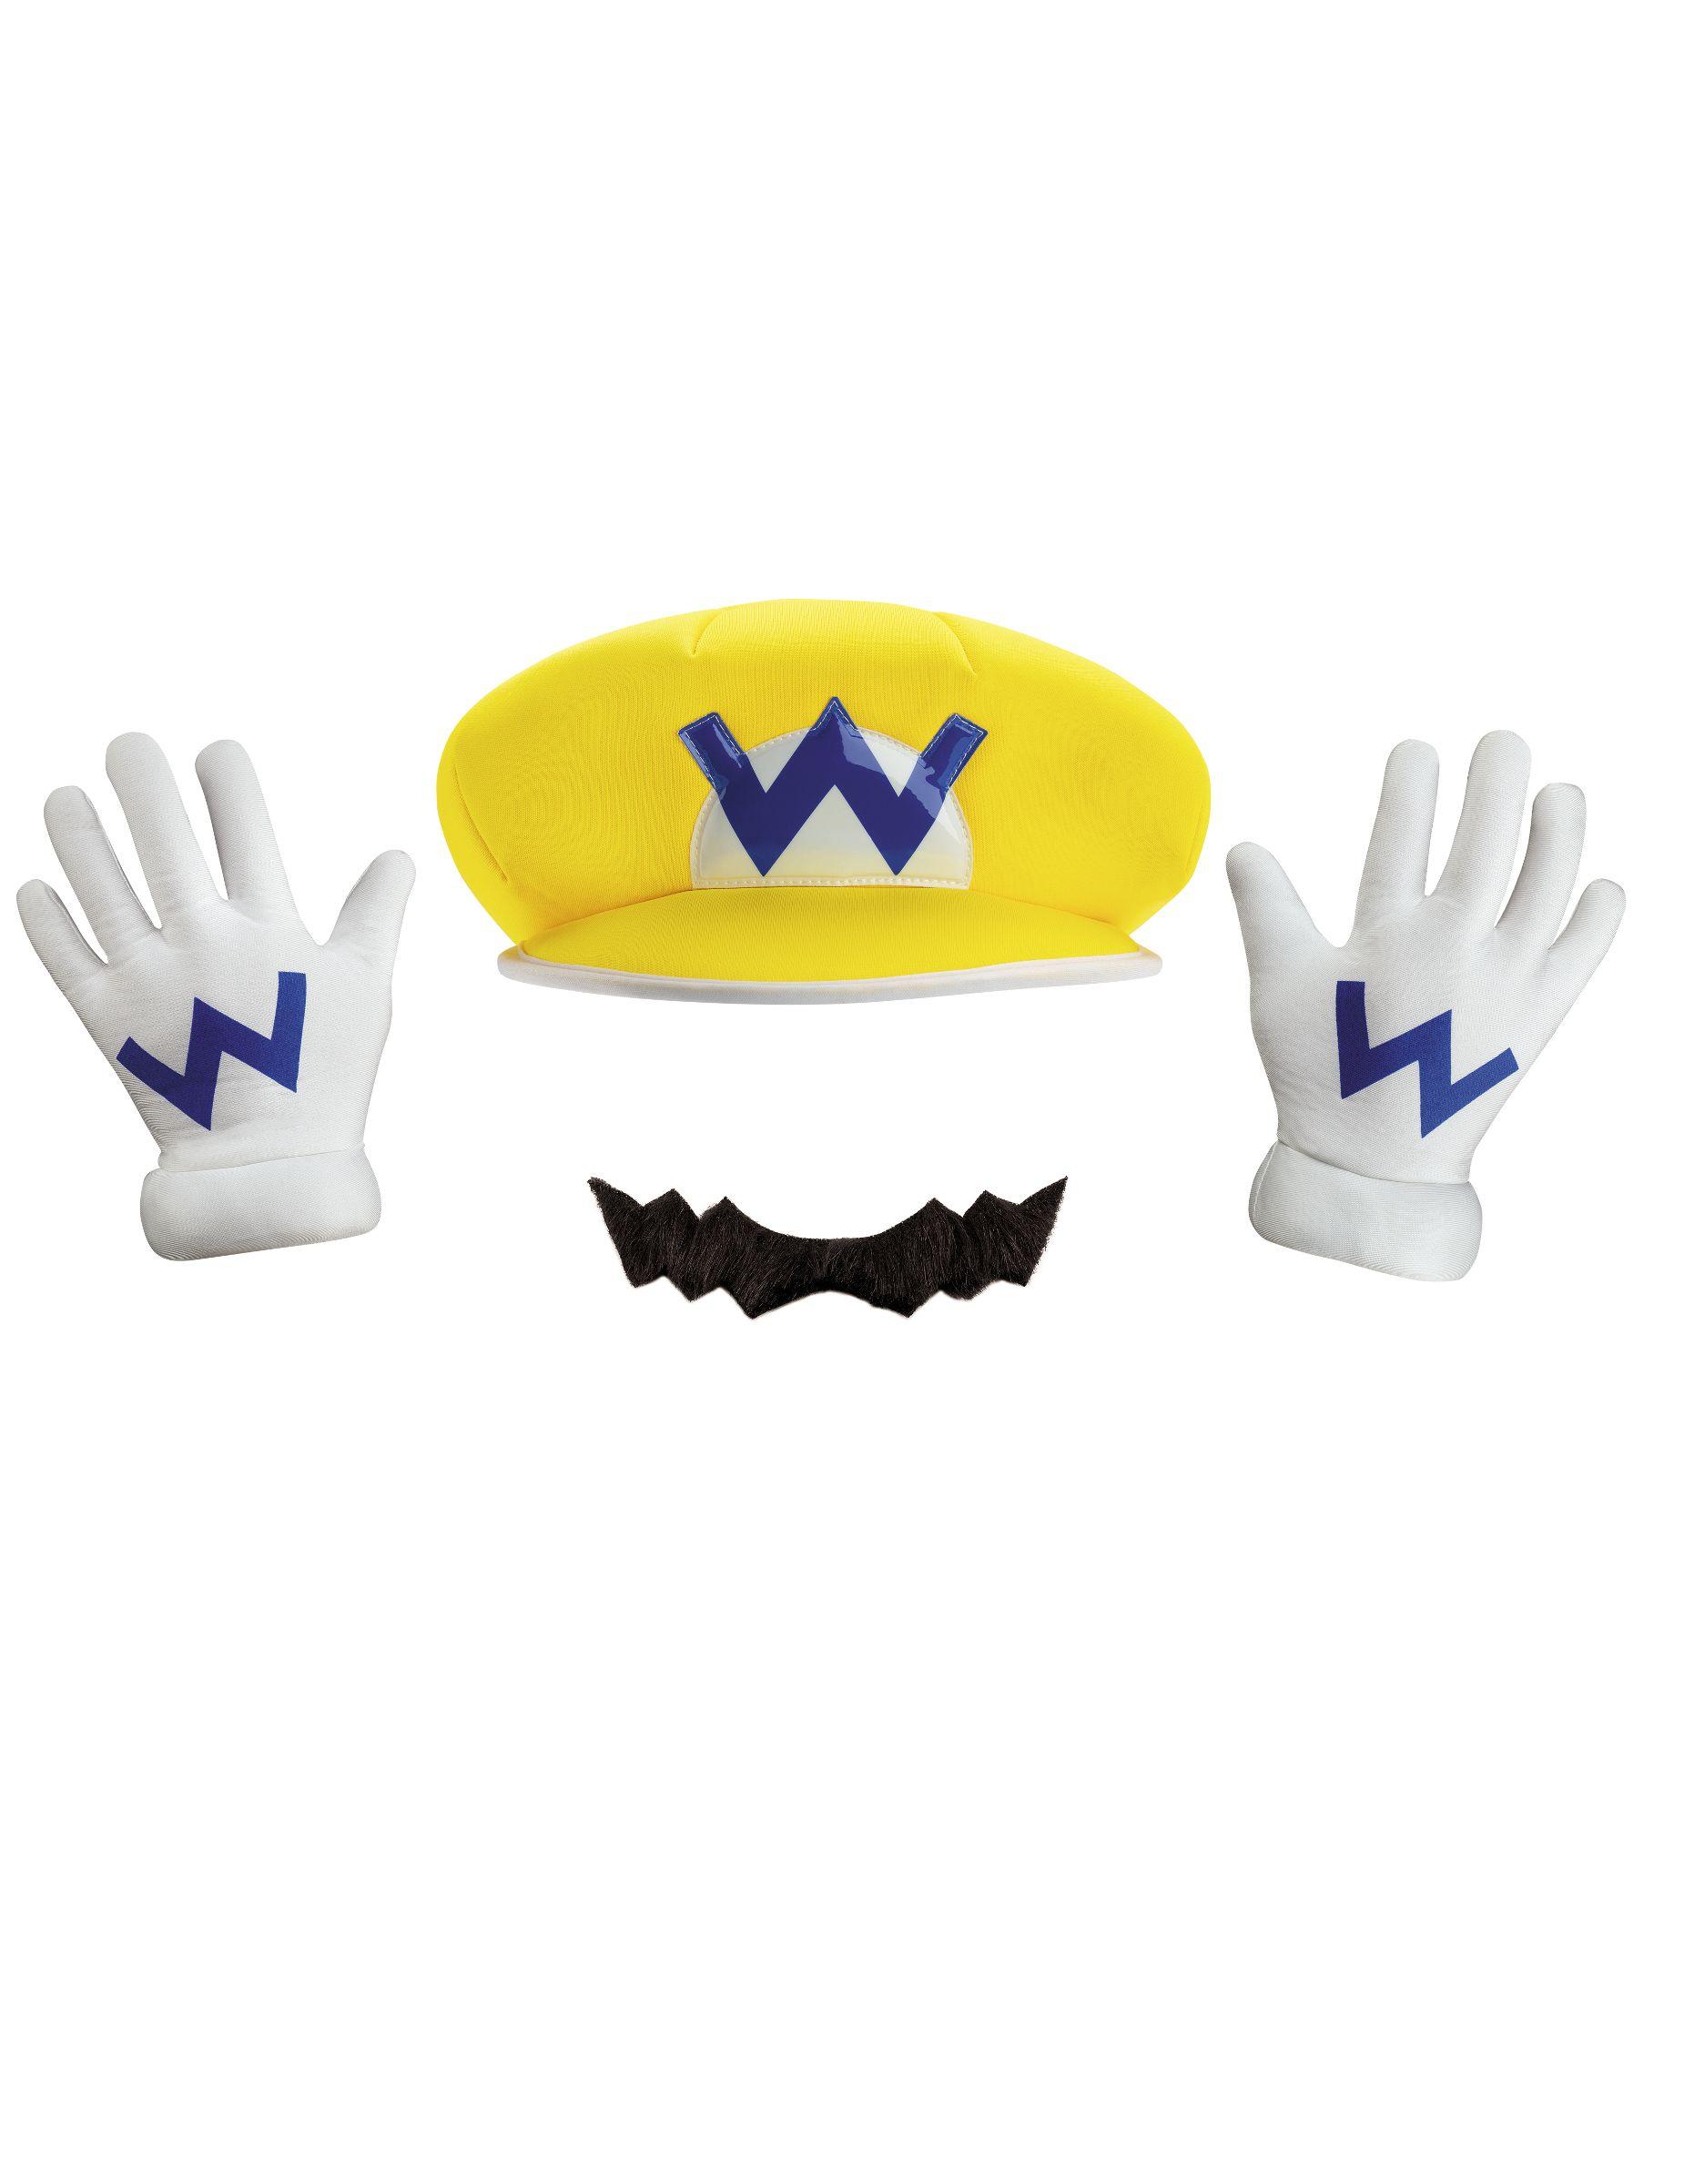 1a1fcb3769bafd Wario-Accessoire-Set für Kinder Nintendo®-Lizenzartikel , günstige  Faschings Accessoires &